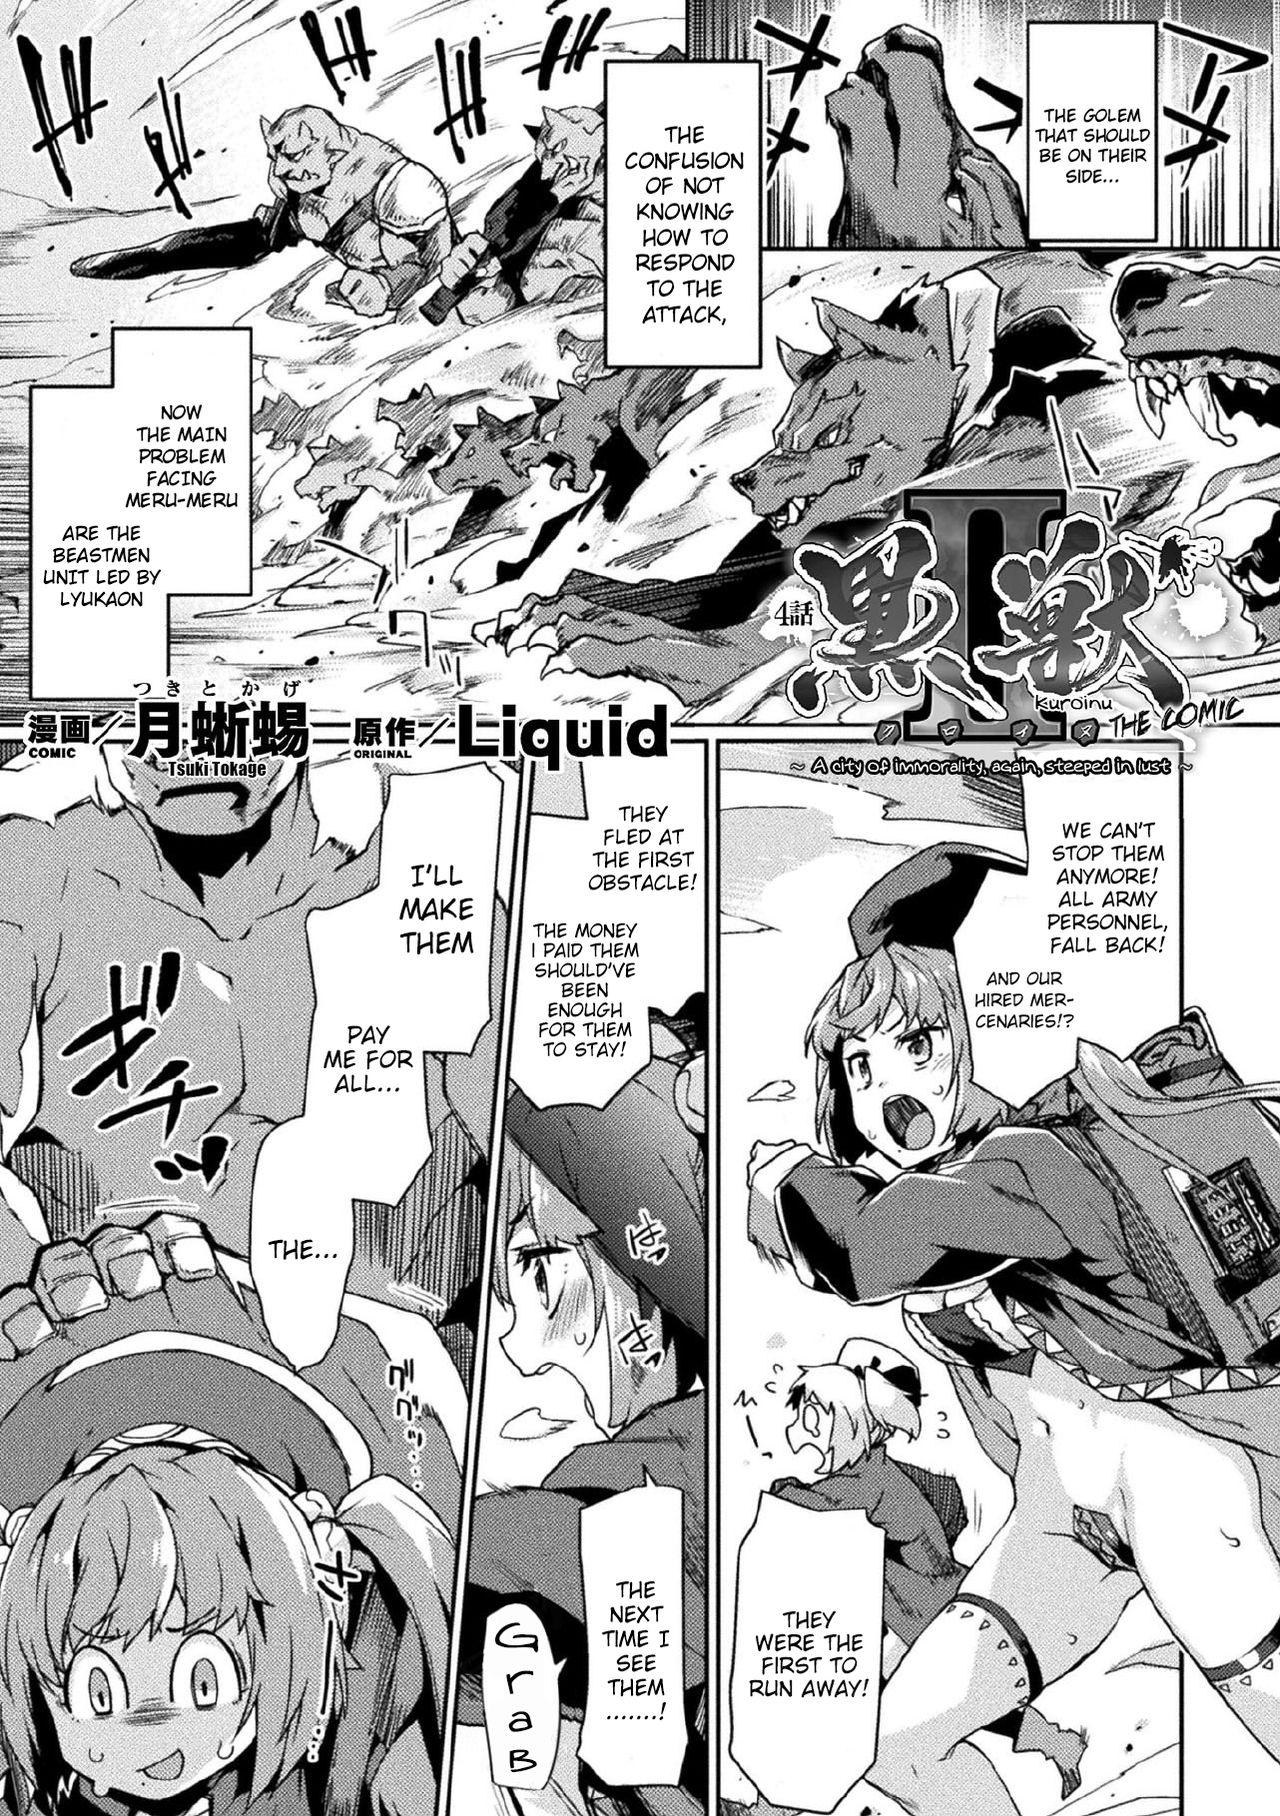 [Tsukitokage] Kuroinu II ~Inyoku ni Somaru Haitoku no Miyako, Futatabi~ THE COMIC Ch. 4 (Kukkoro Heroines Vol. 3) [Digital] [English] [Decensored] (Klub Kemoner, Raknnkarscans) 0